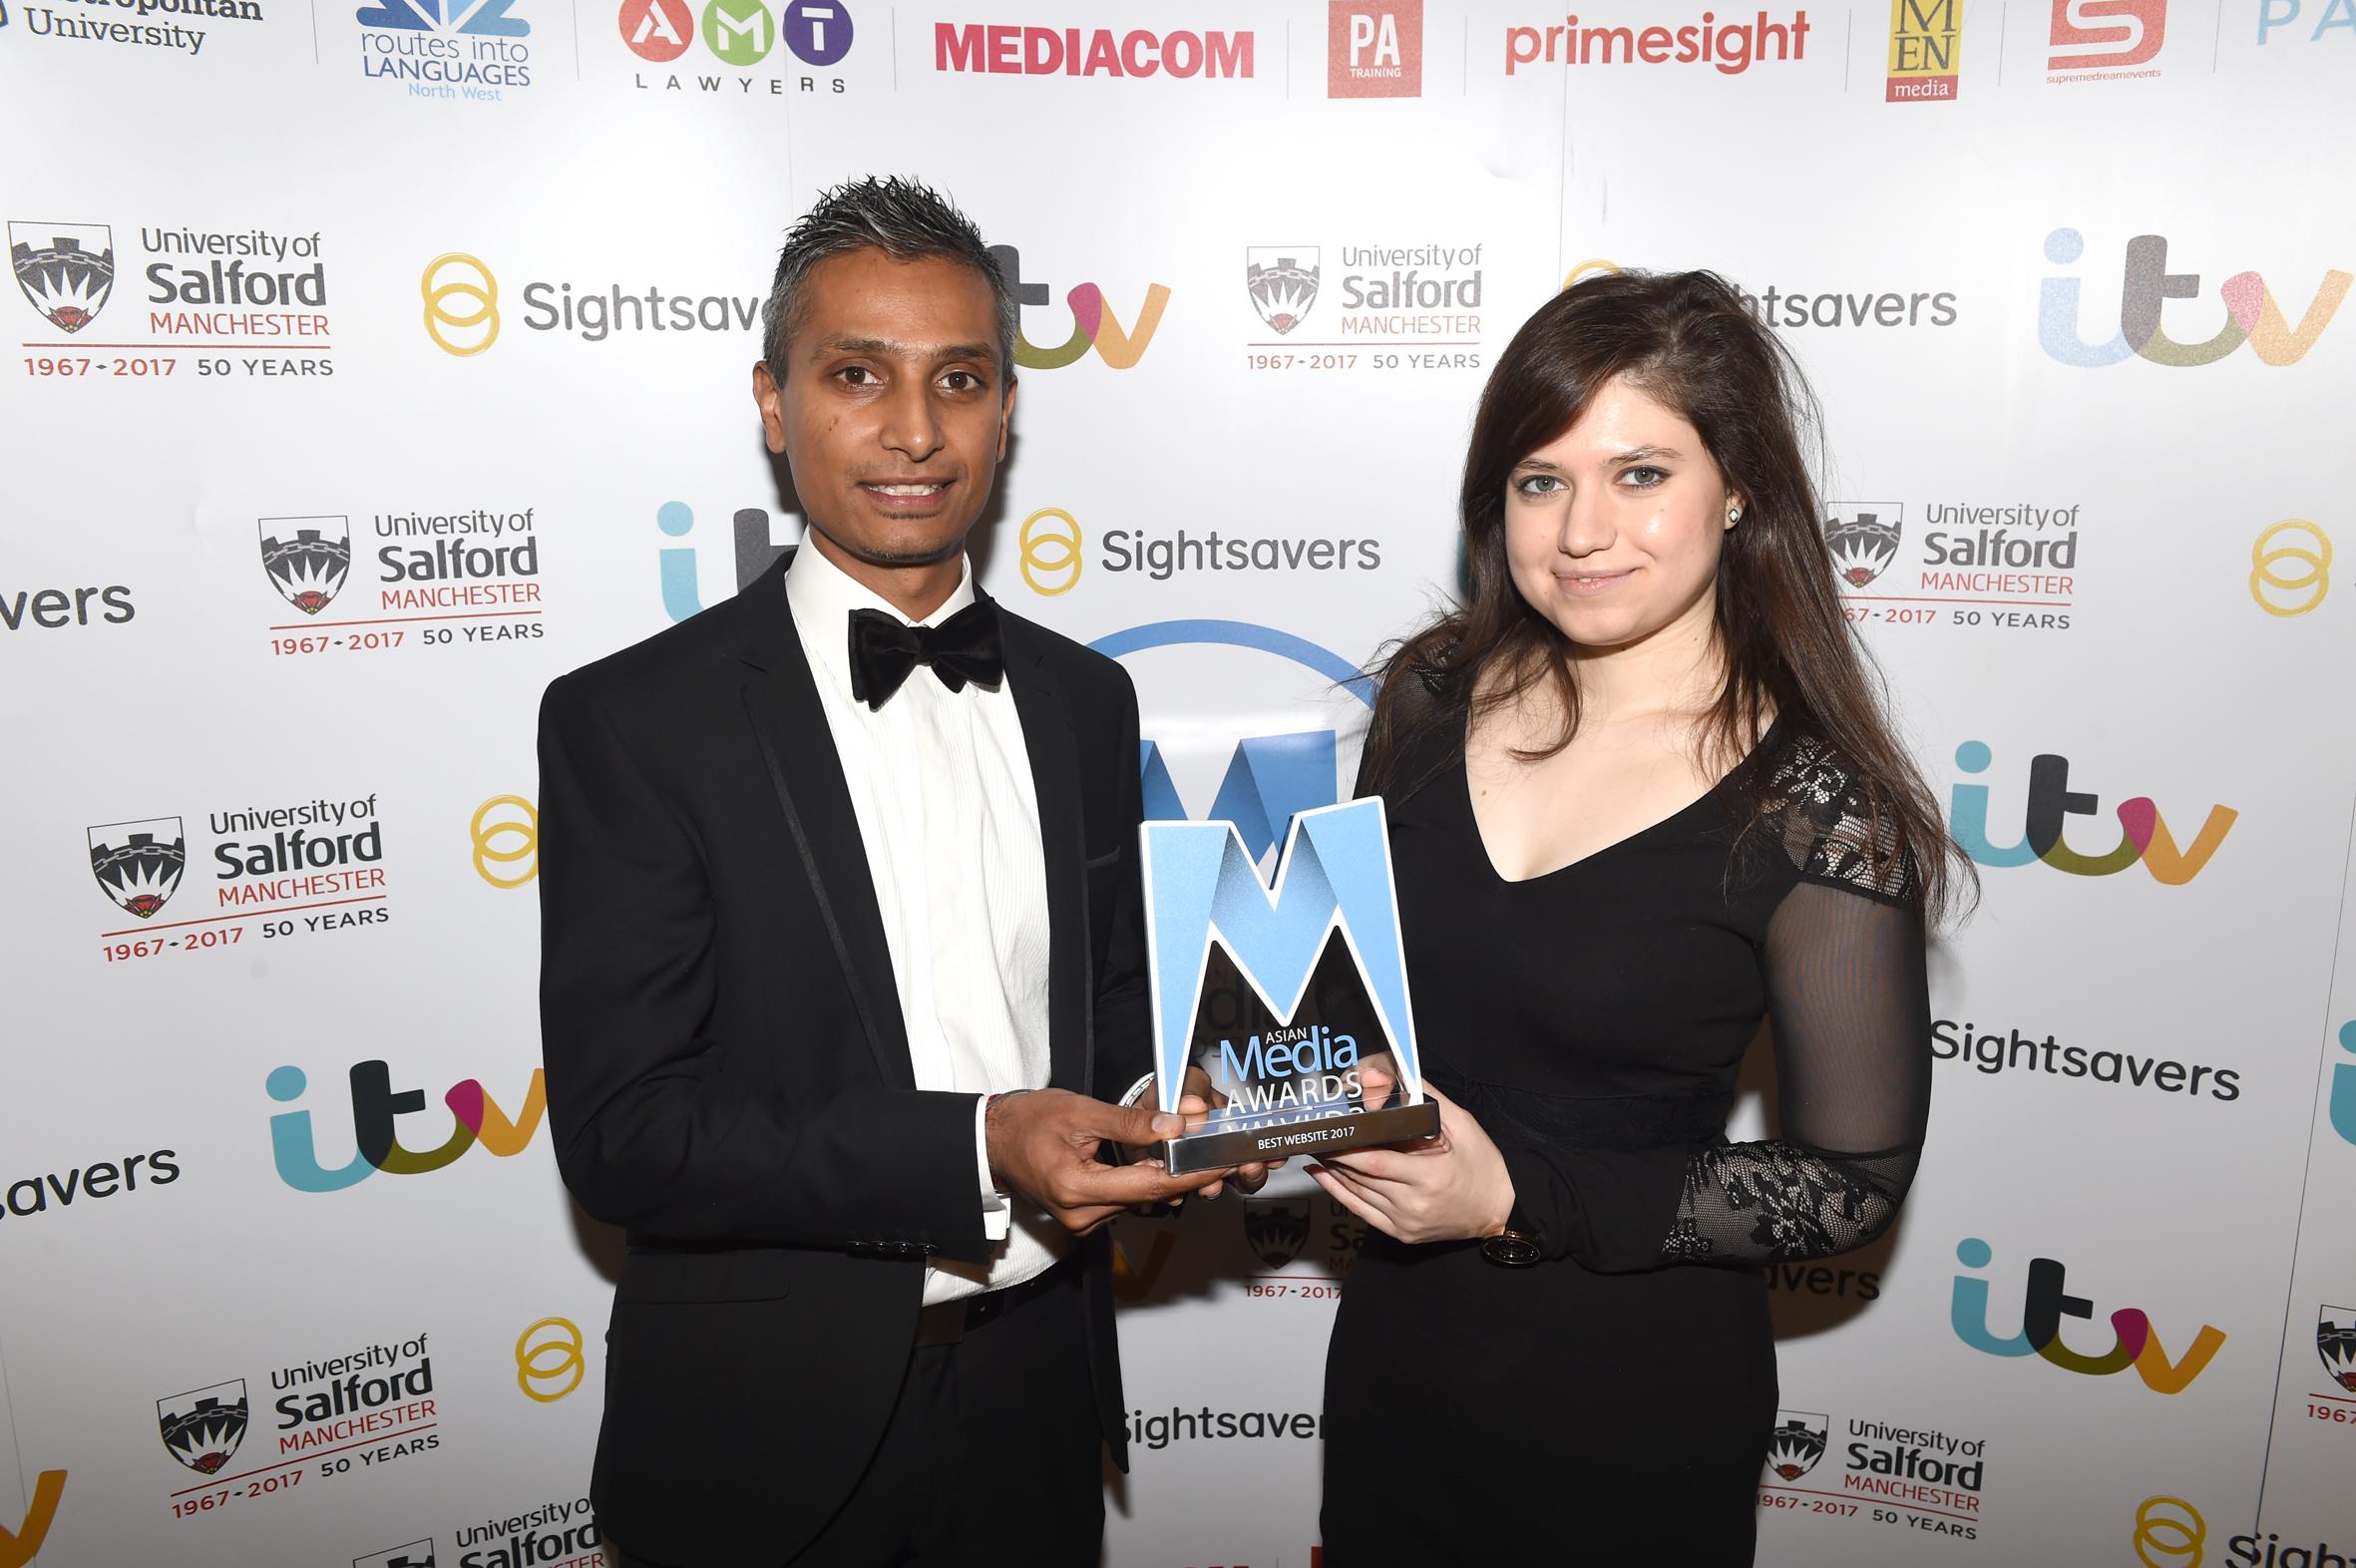 DESI Blitz secures third Best Website Award